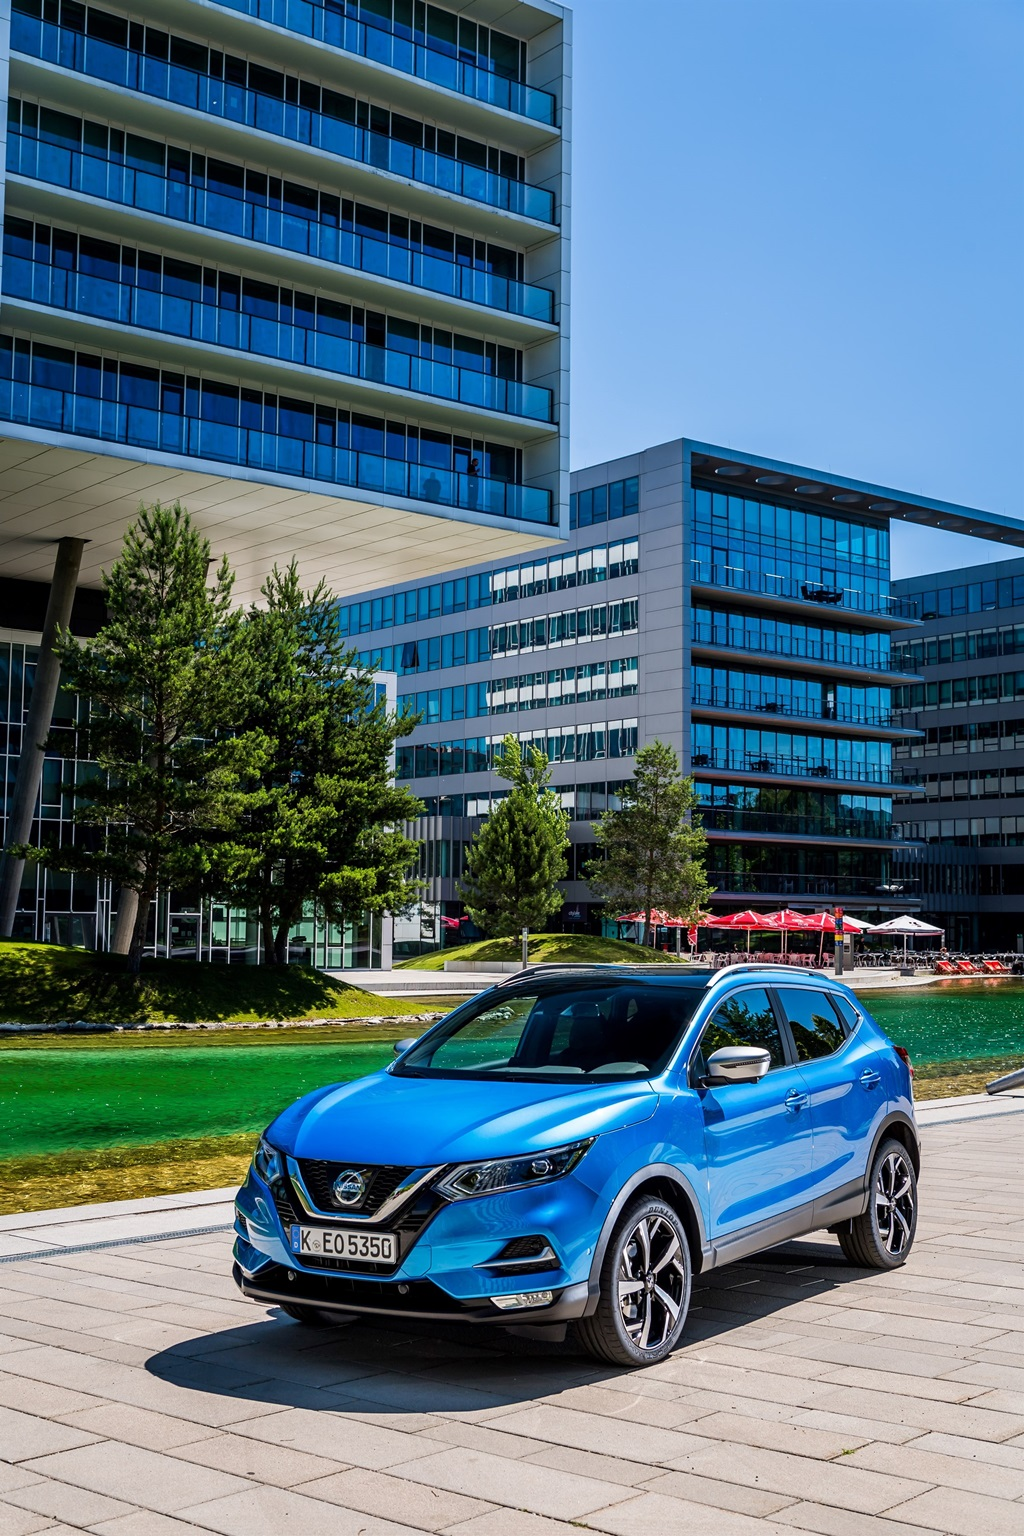 Az új Nissan Qashqai prémium crossover